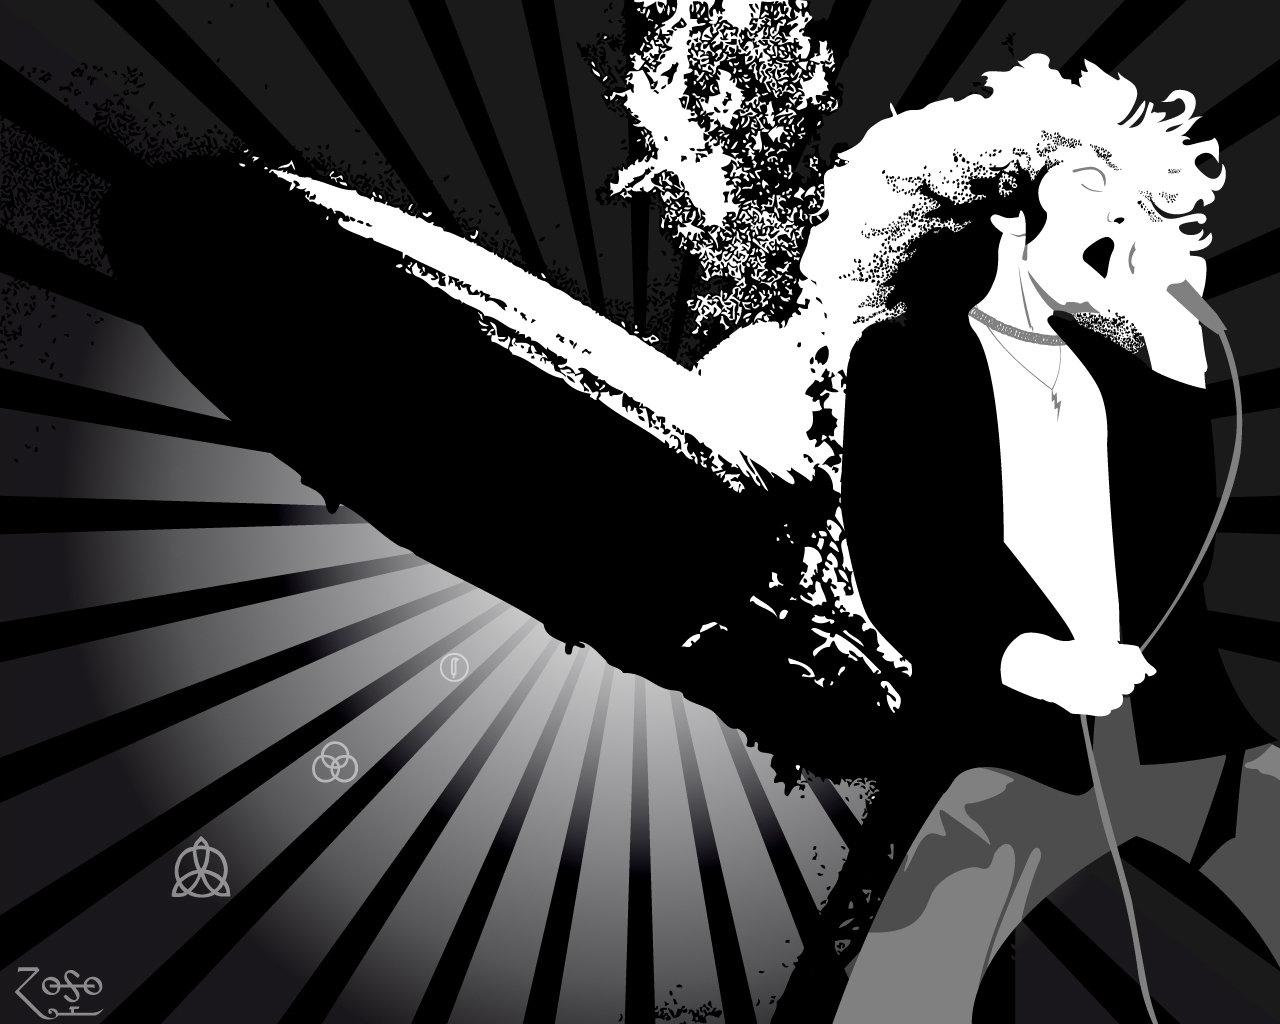 Led Zeppelin Wallpapers 1280x1024 Desktop Backgrounds